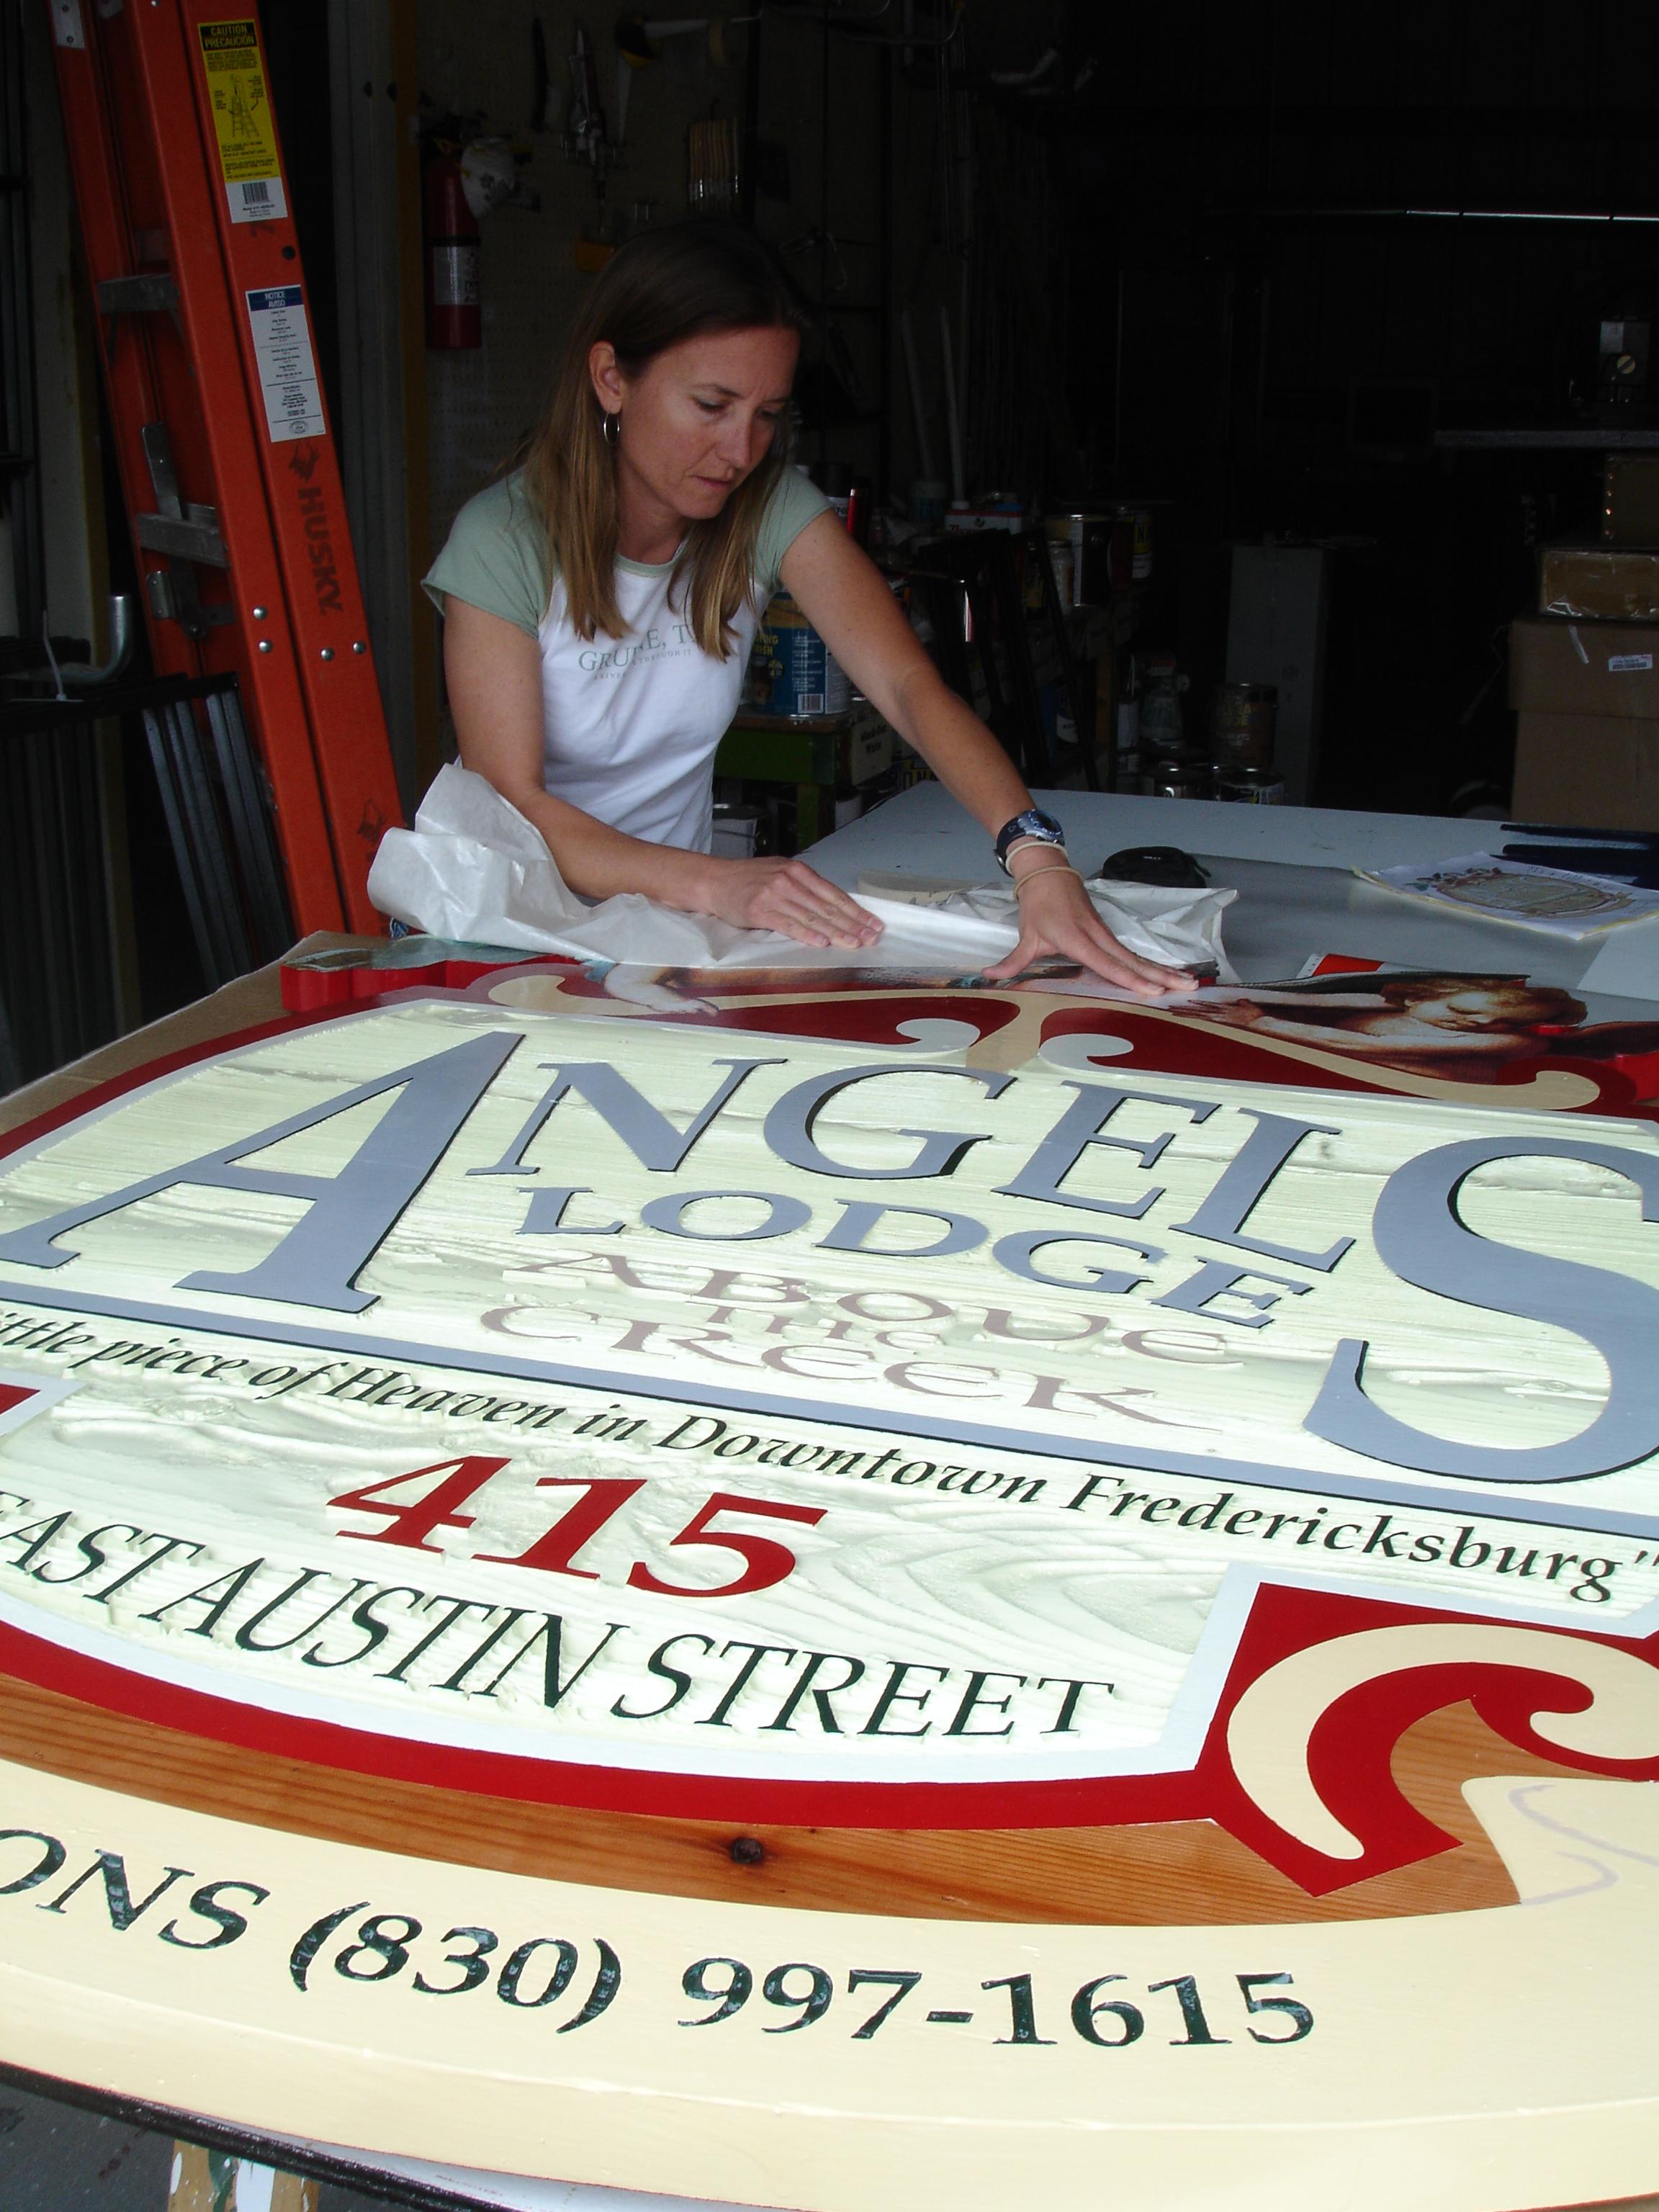 Angels Lodge - Ron Ross - lk9895 - 1.JPG